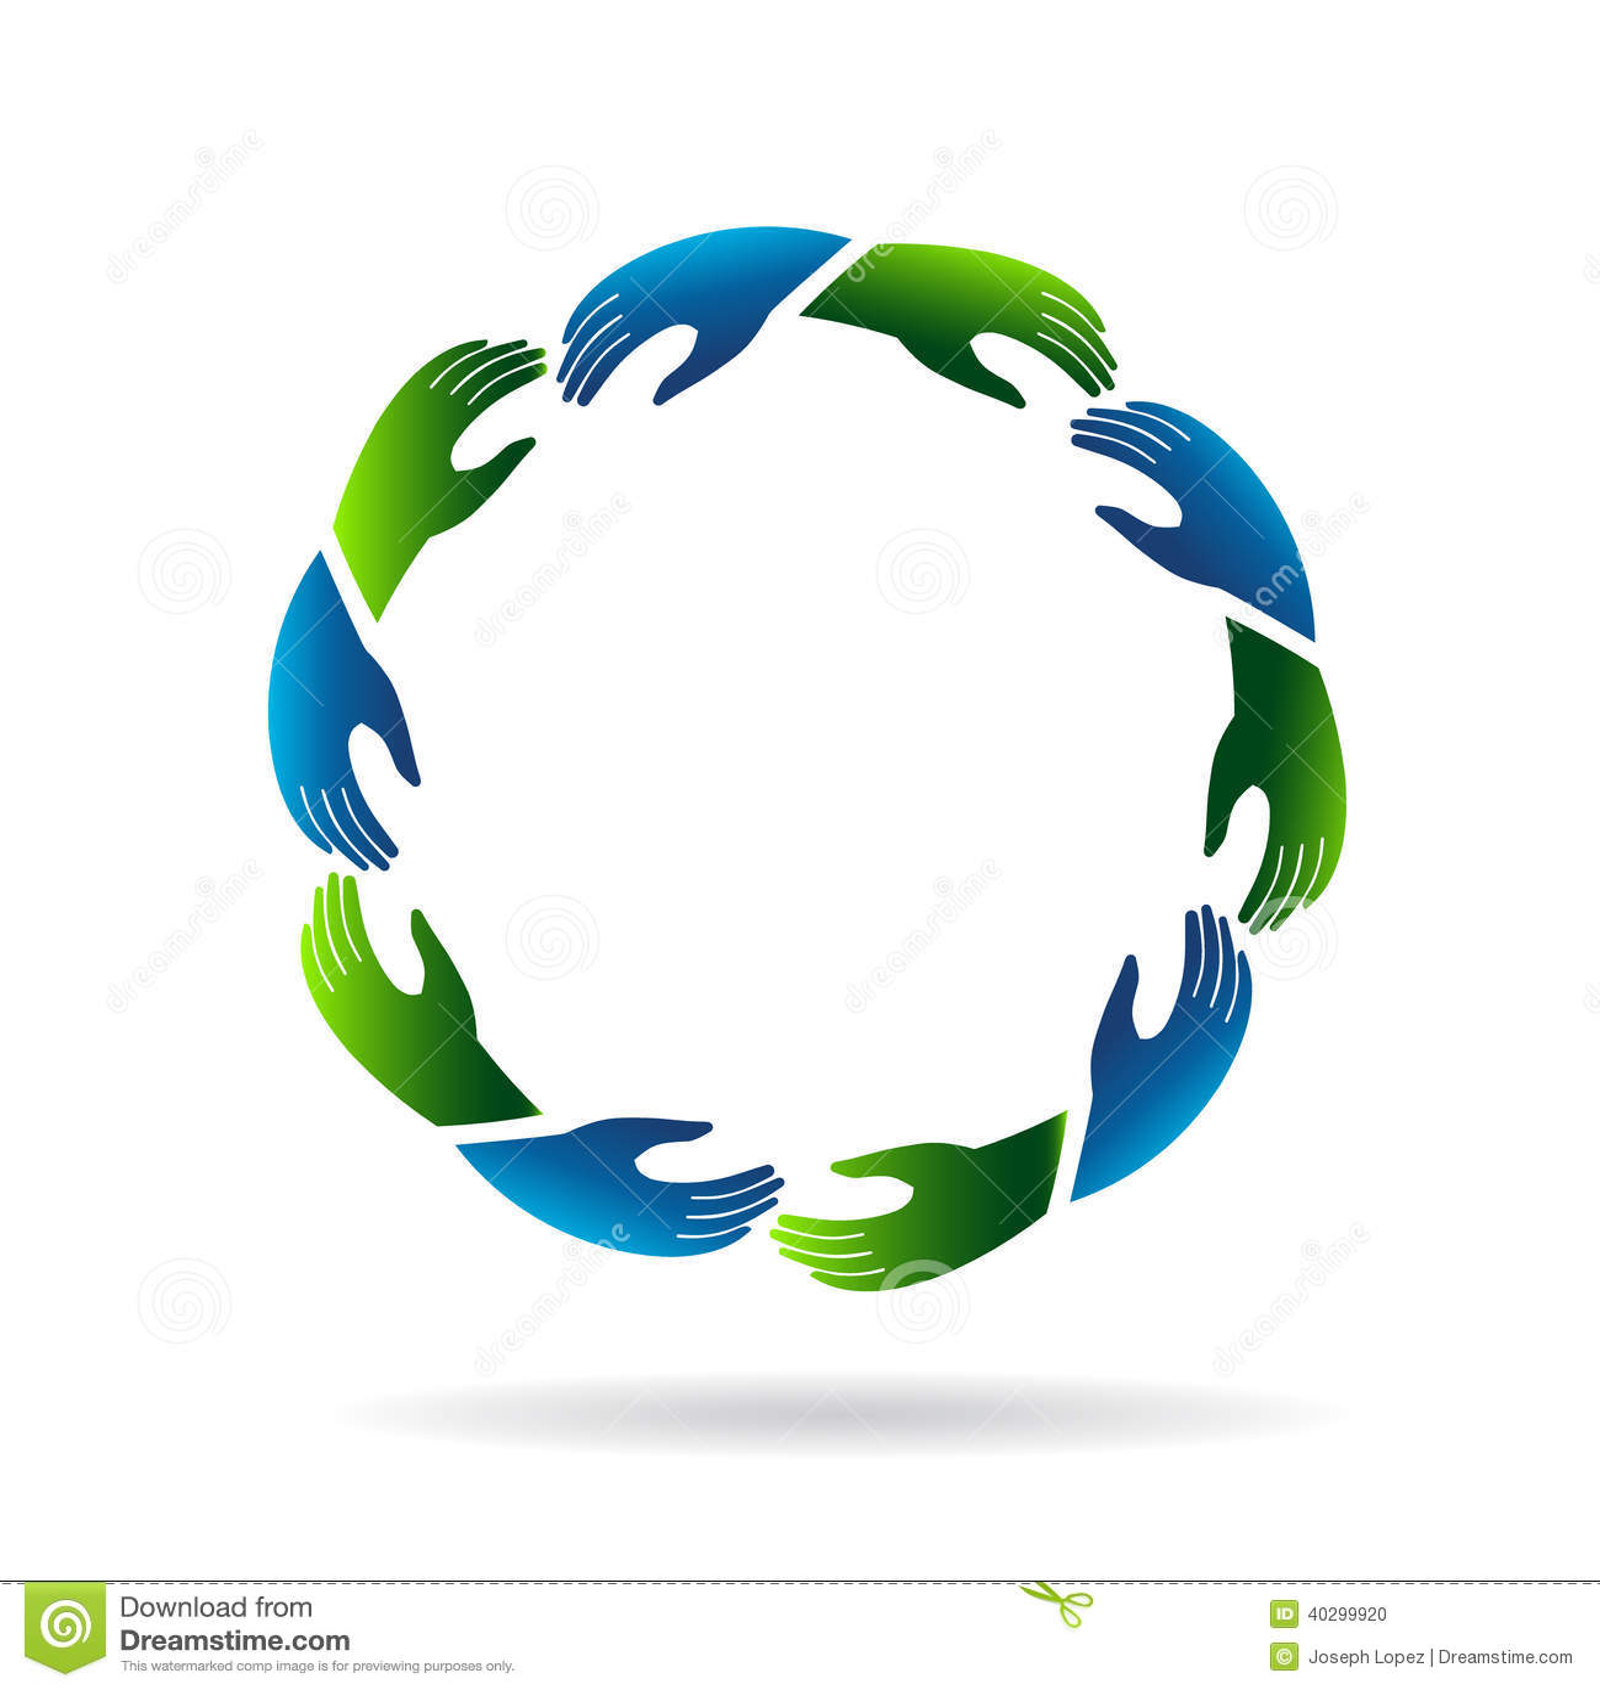 Hands Reaching Image Logo Stock Vector Image 40299920